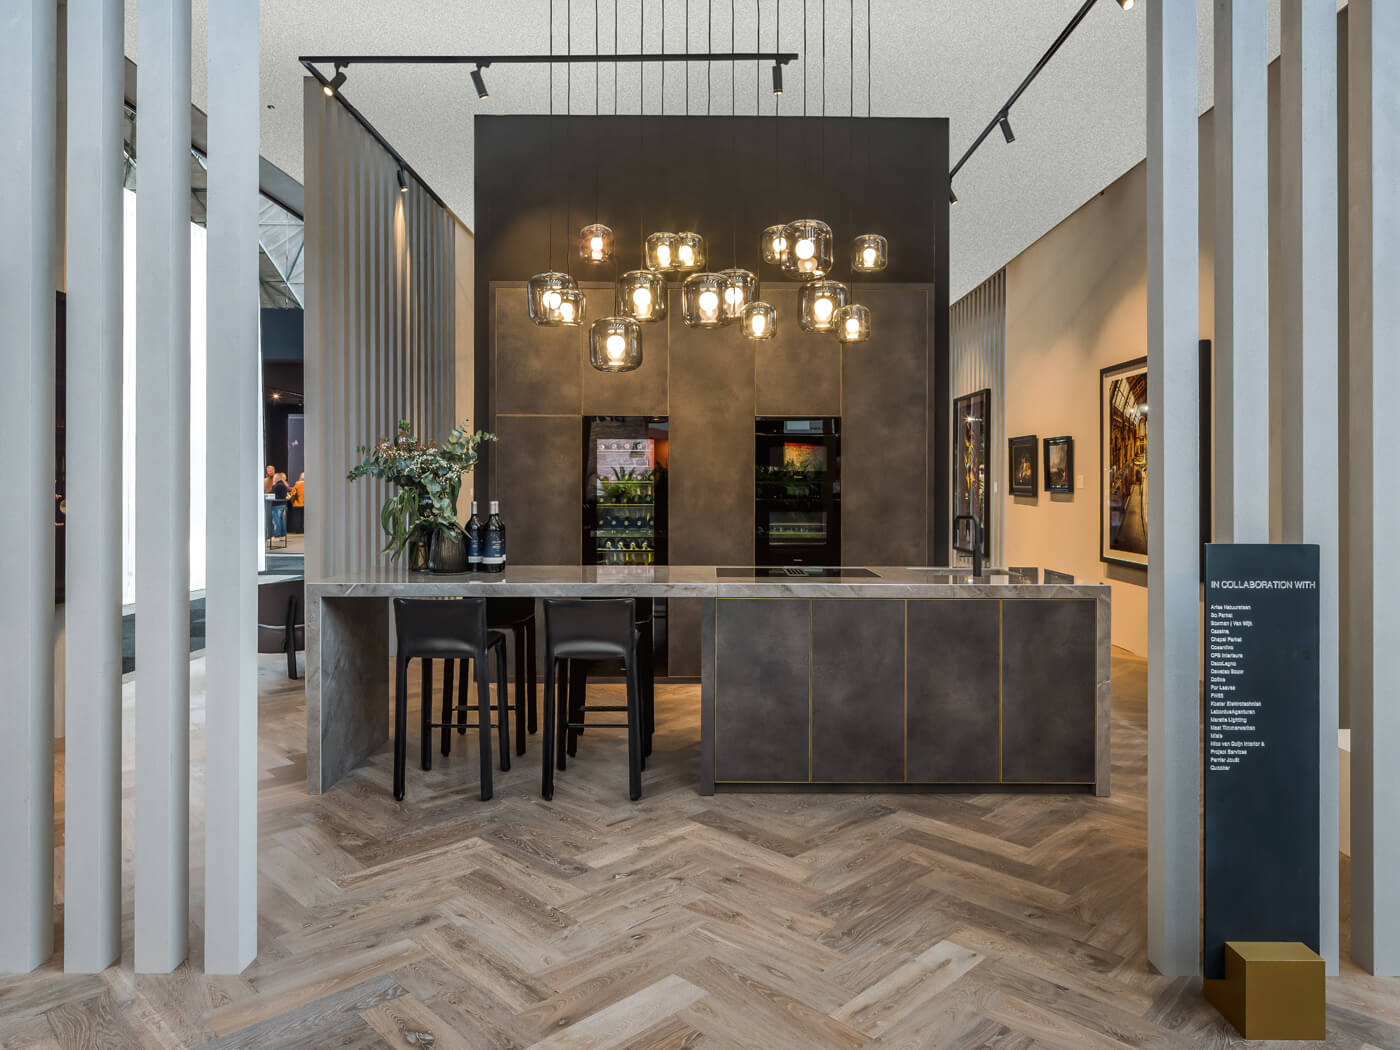 Stand design Mariska Jagt Masters of LXRY 2019